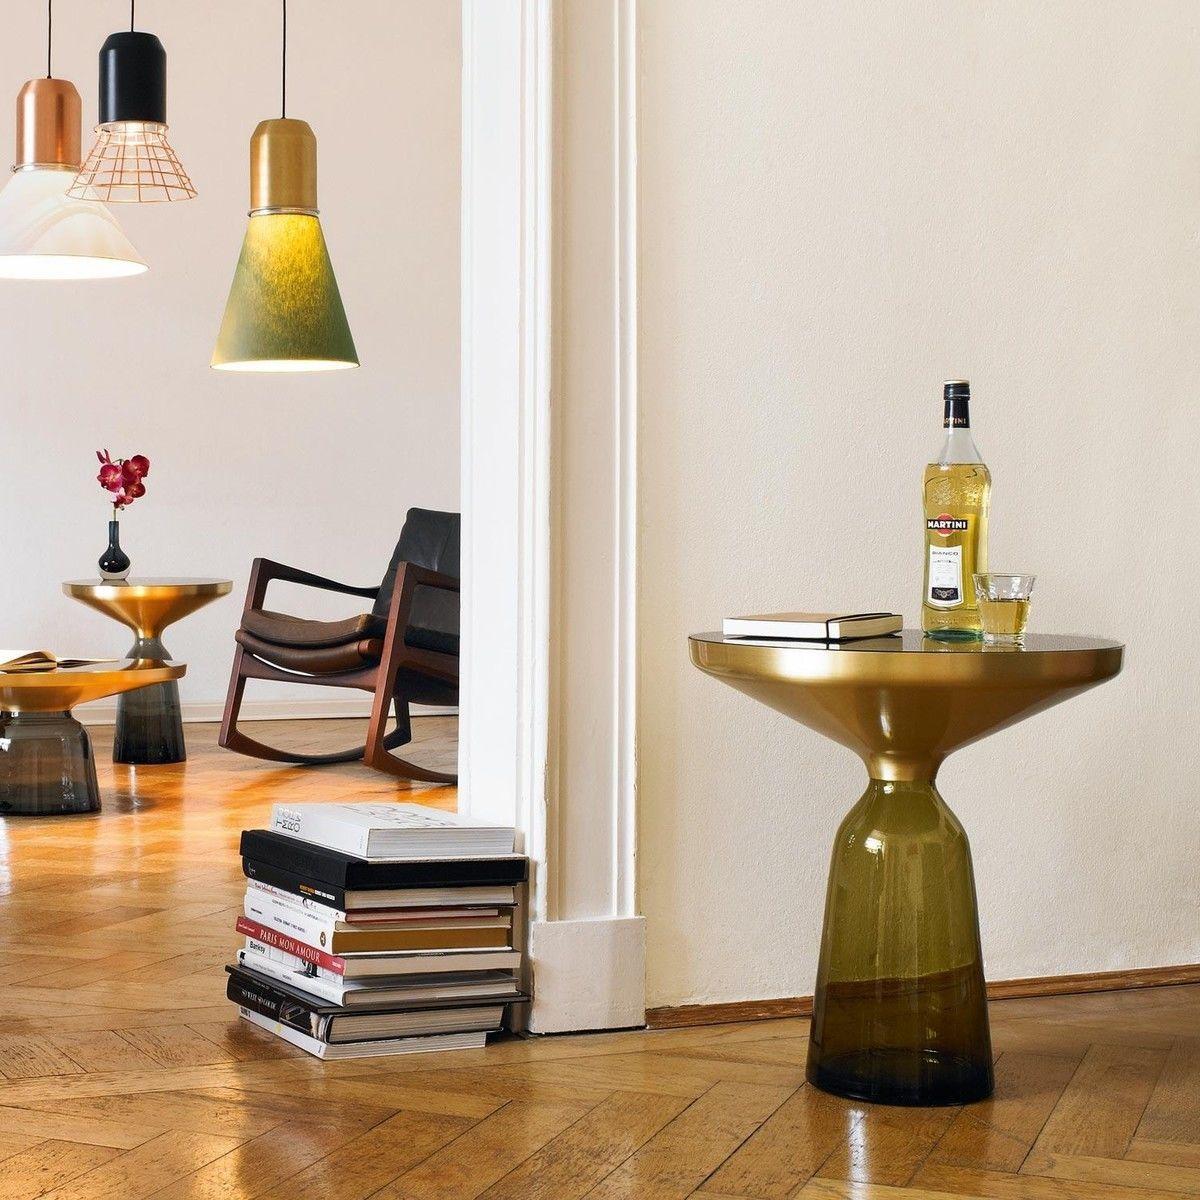 bell beistelltisch messing classicon. Black Bedroom Furniture Sets. Home Design Ideas